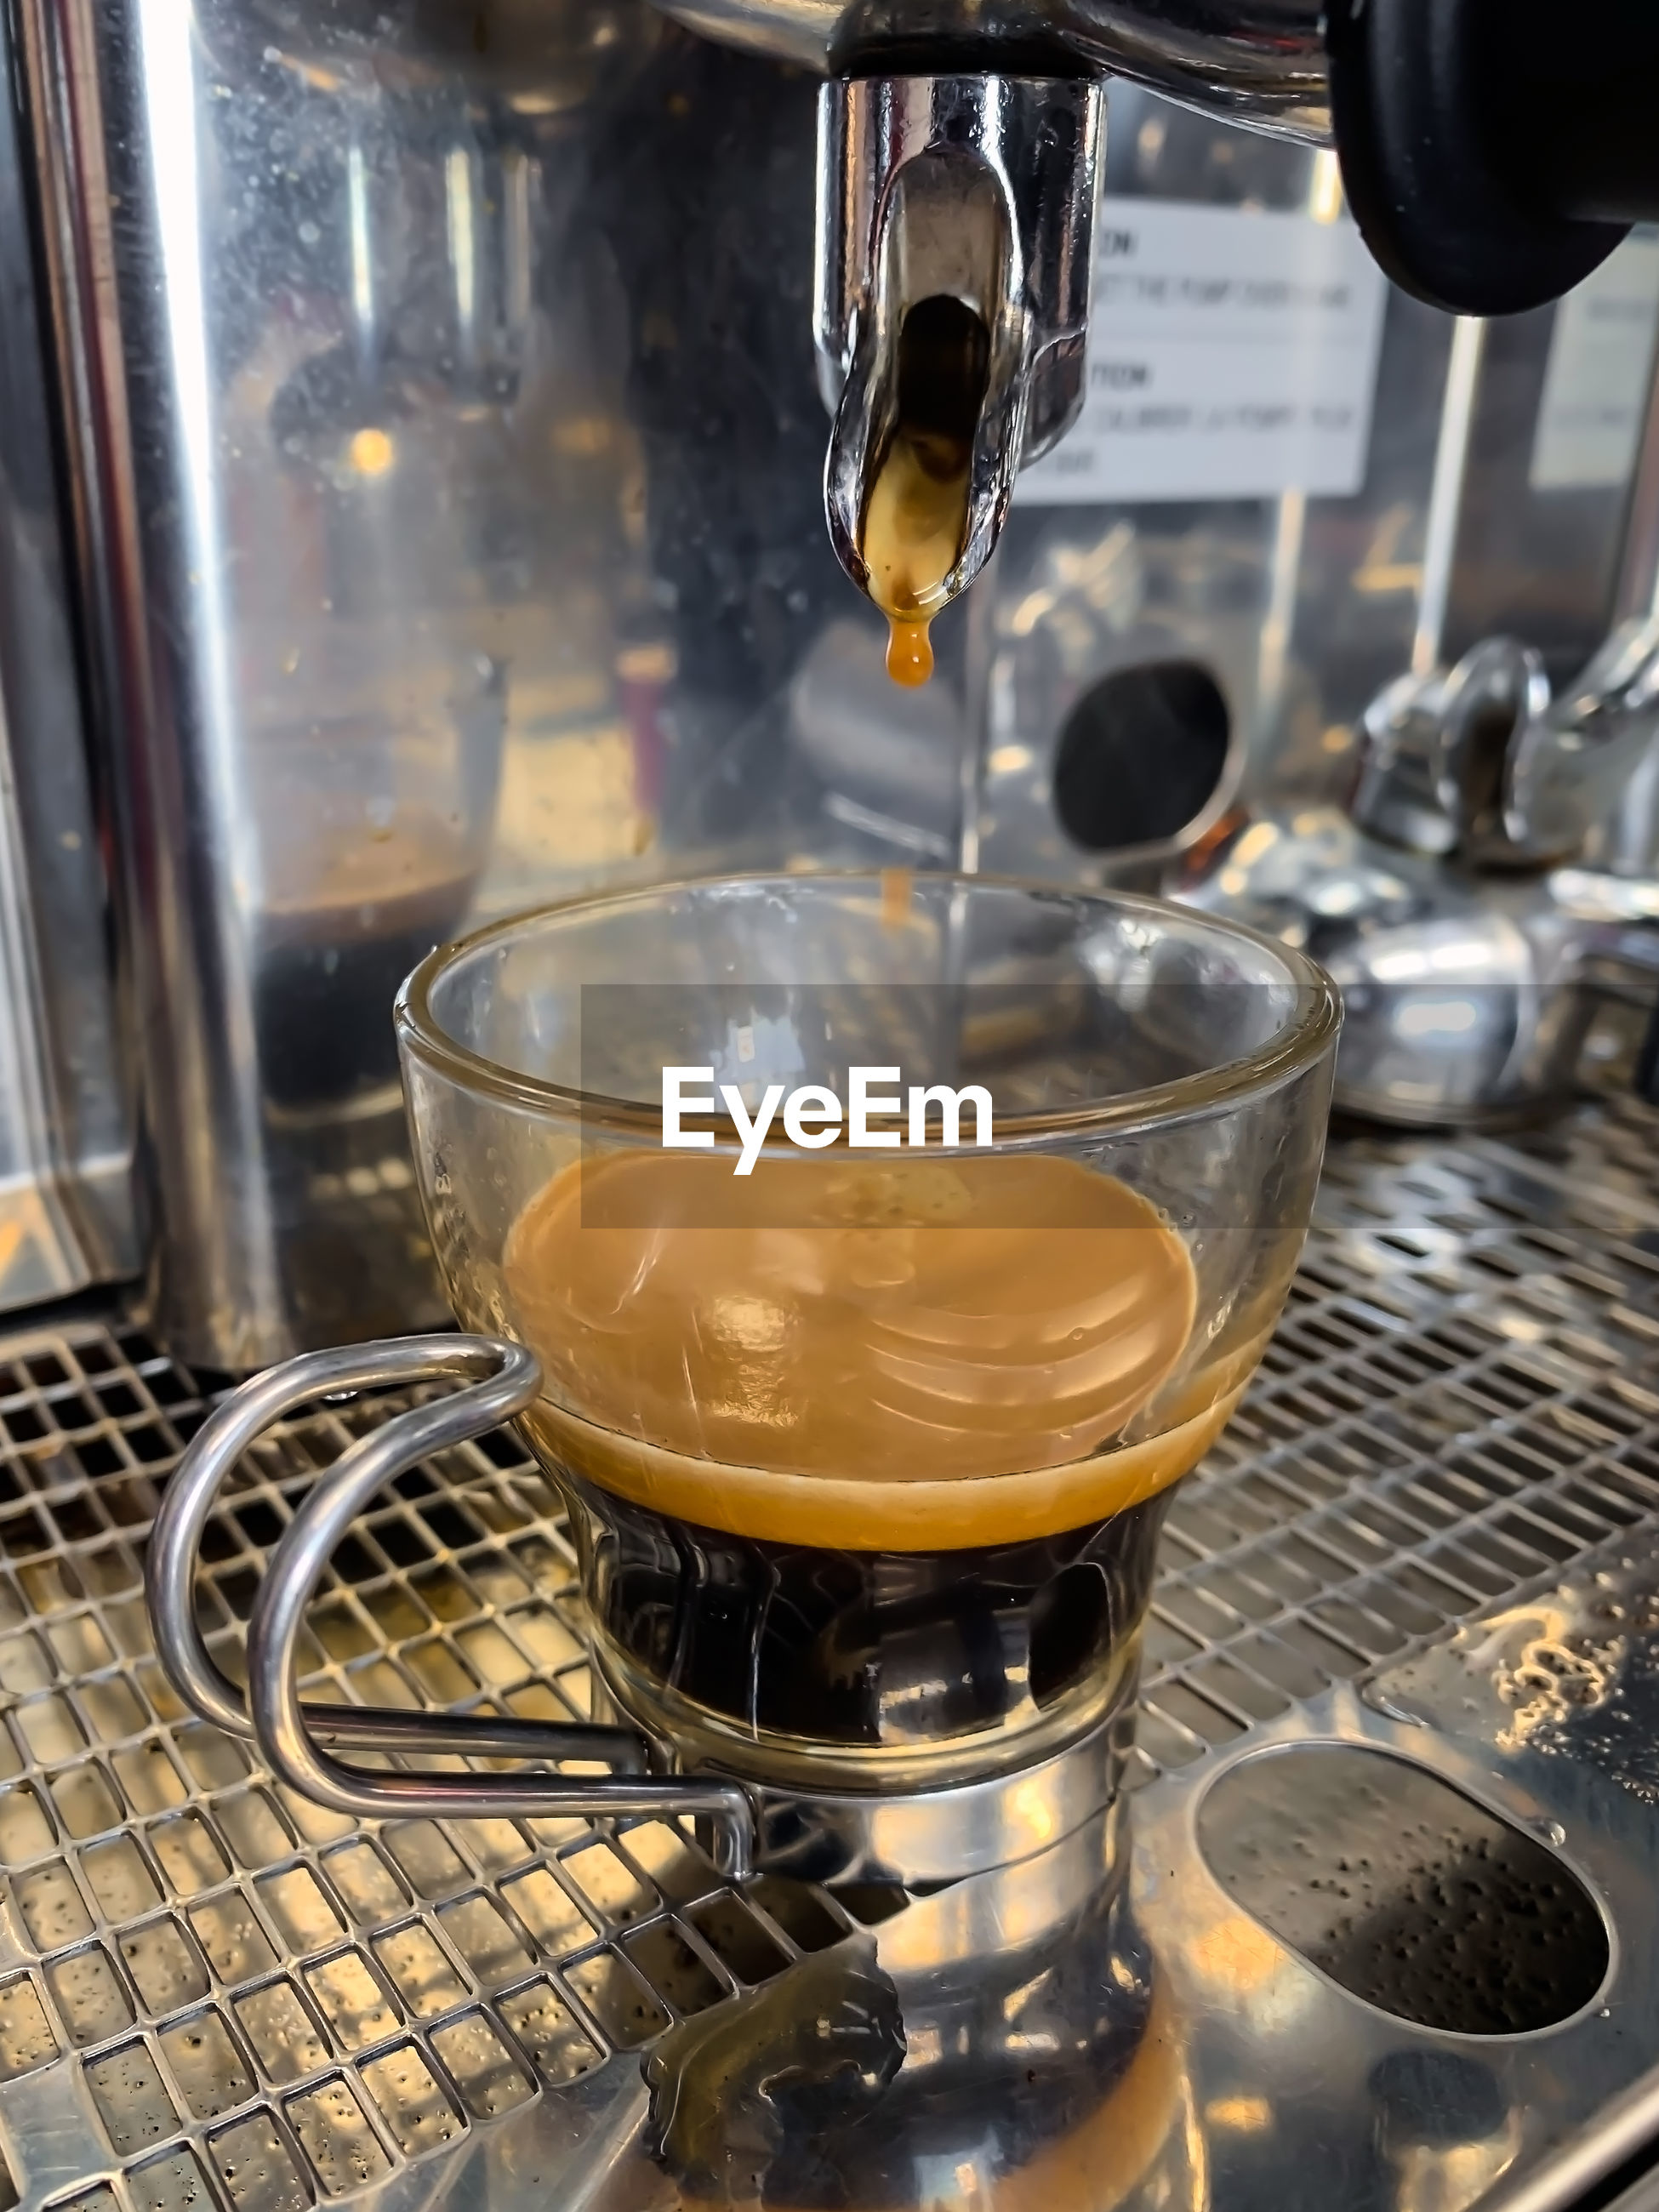 Espresso shot in a shot glass on an espresso maker.